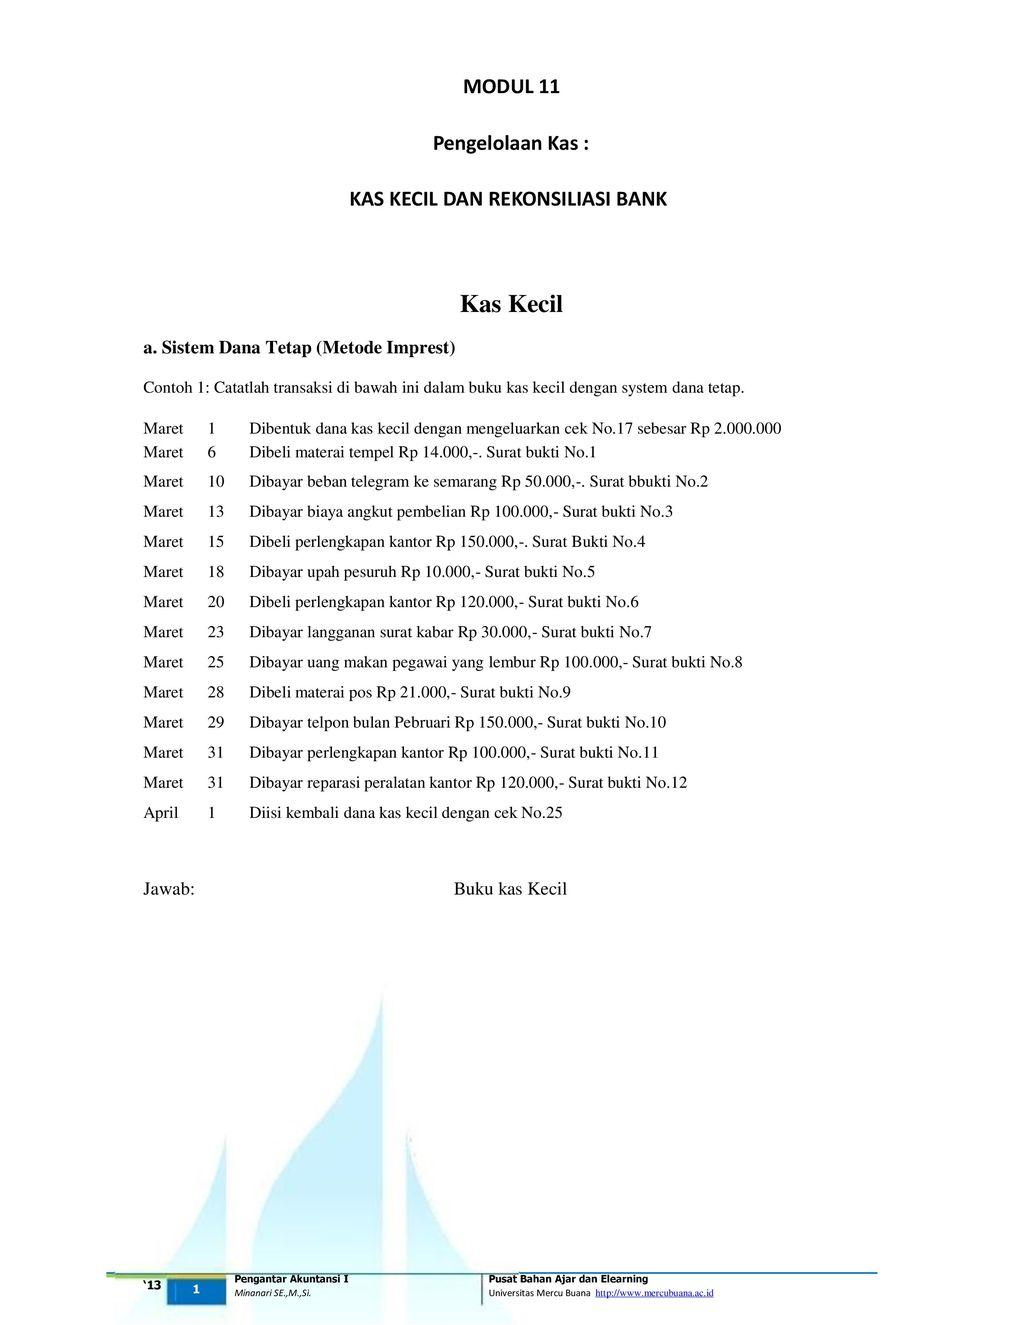 Modul 11 Pengelolaan Kas Kas Kecil Dan Rekonsiliasi Bank Kas Kecil Ppt Download